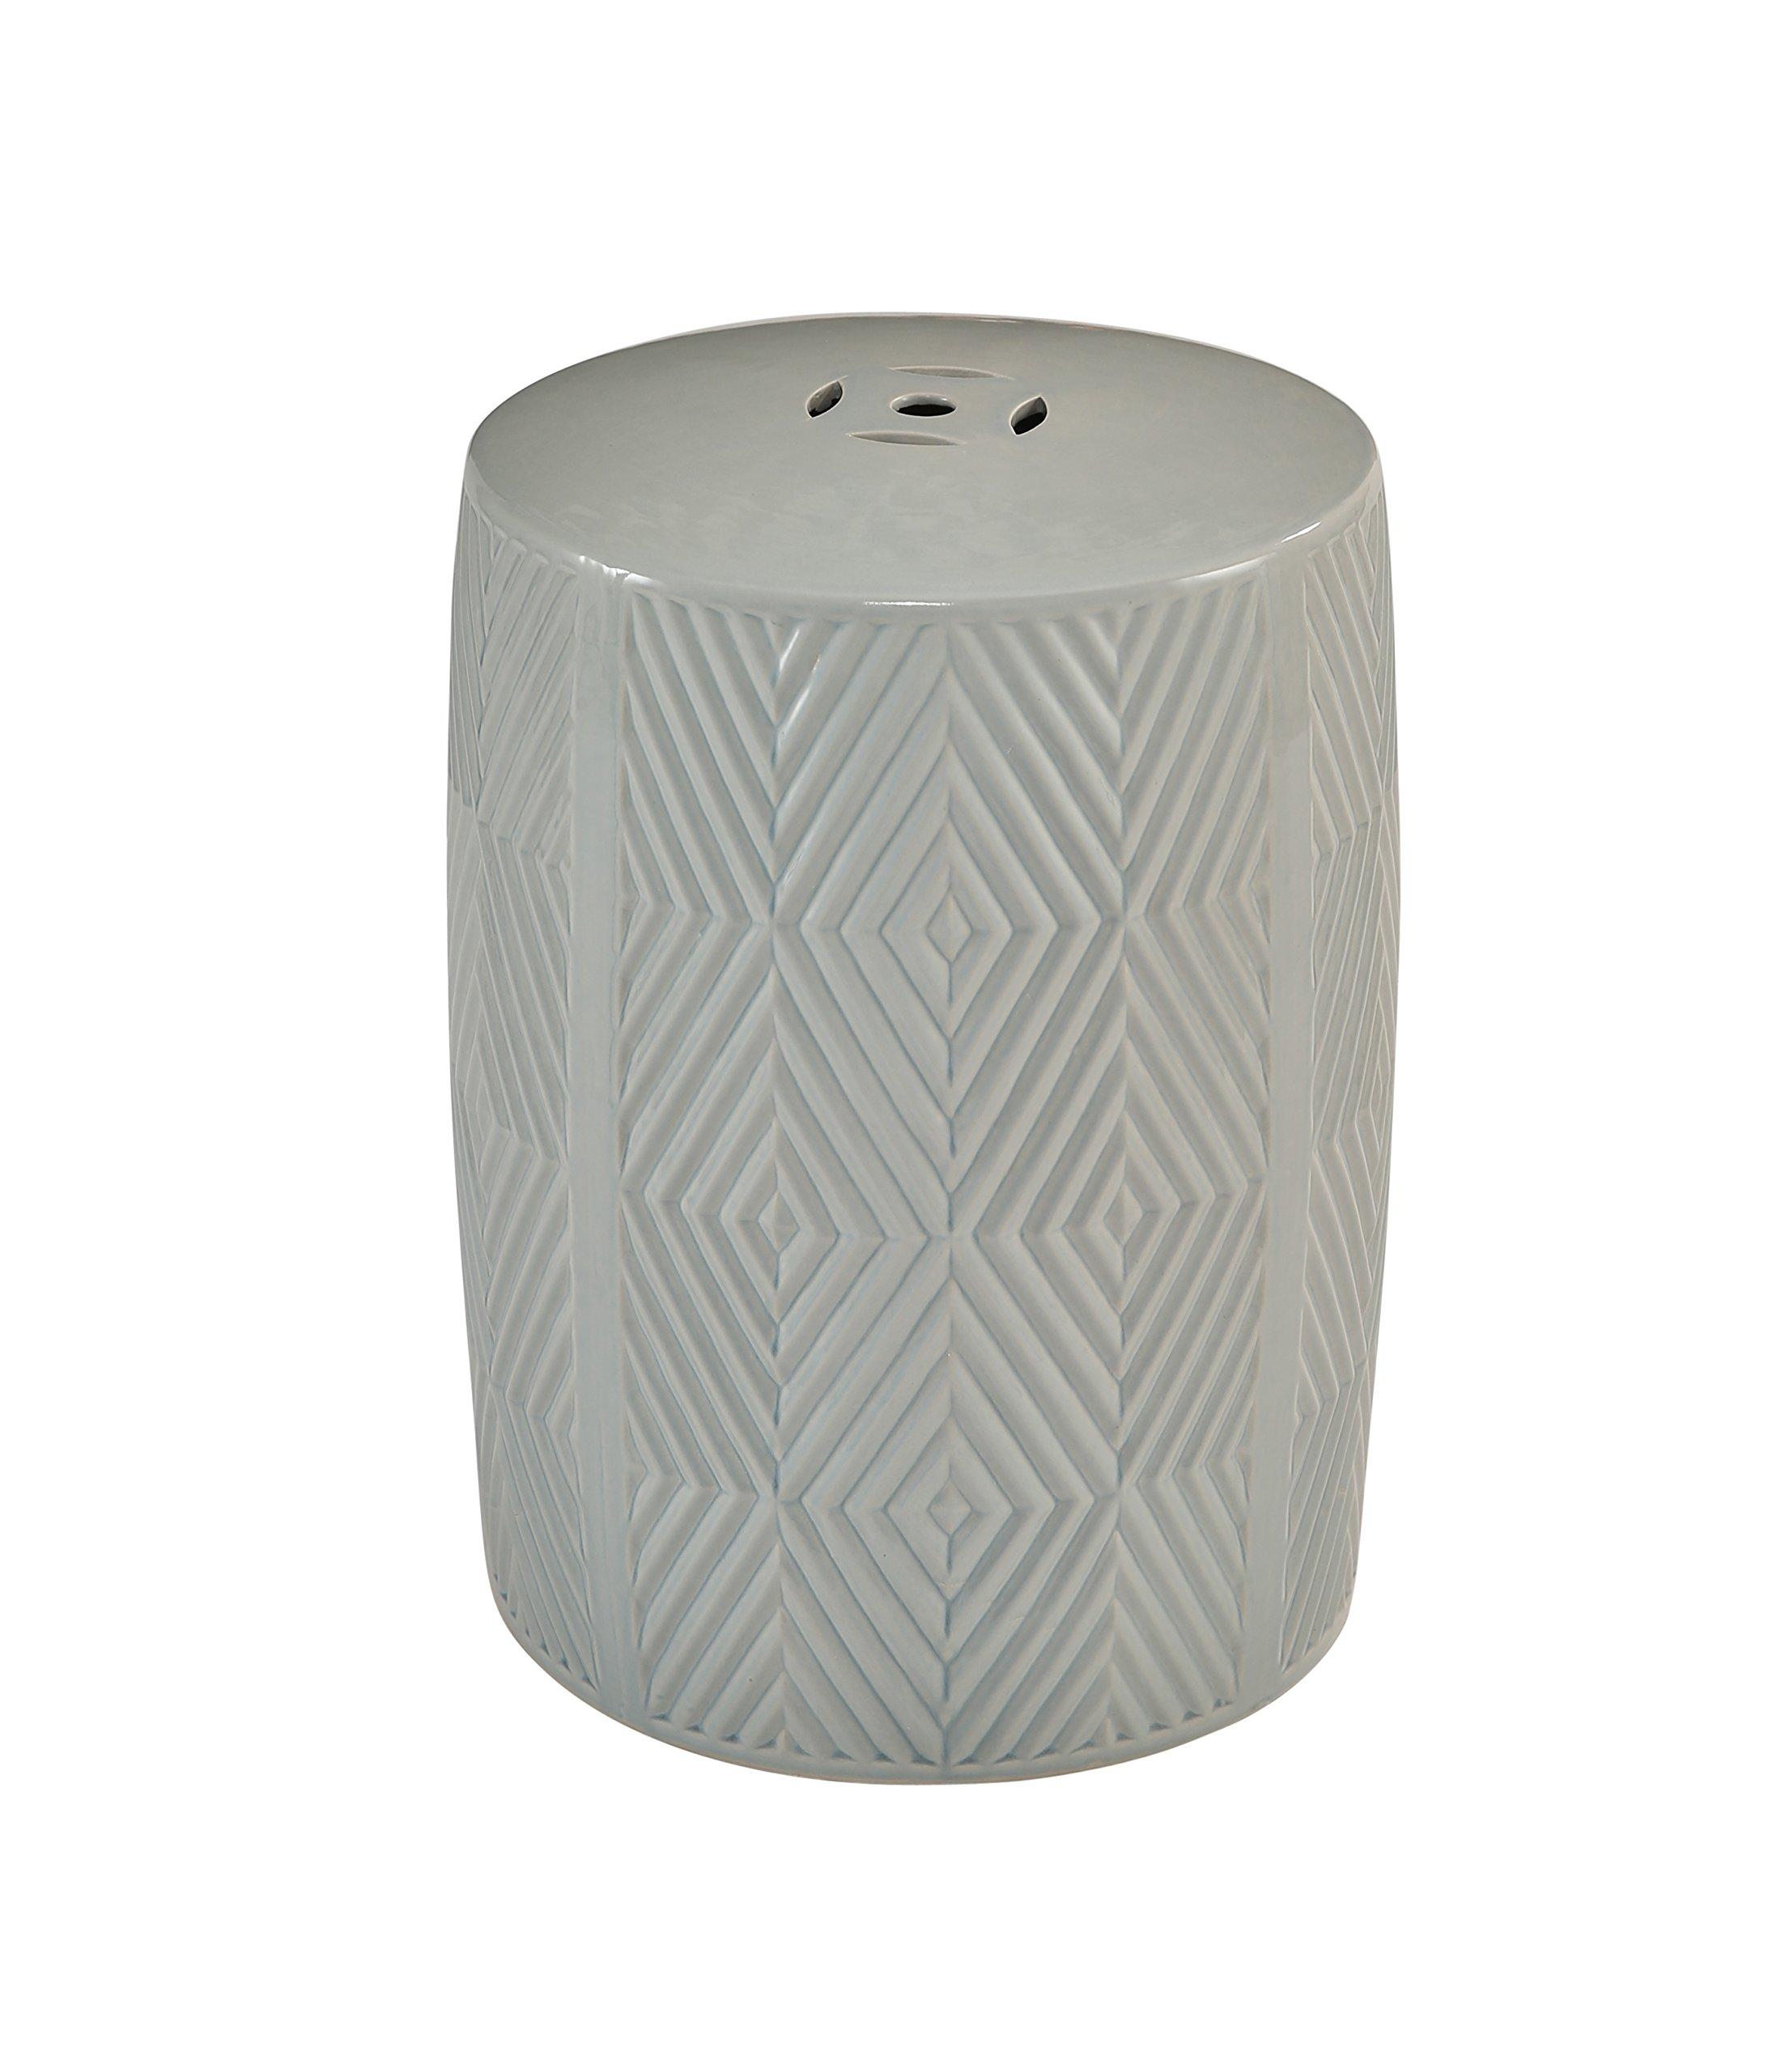 Abbyson® Rayce Ceramic Garden Stool, Grey